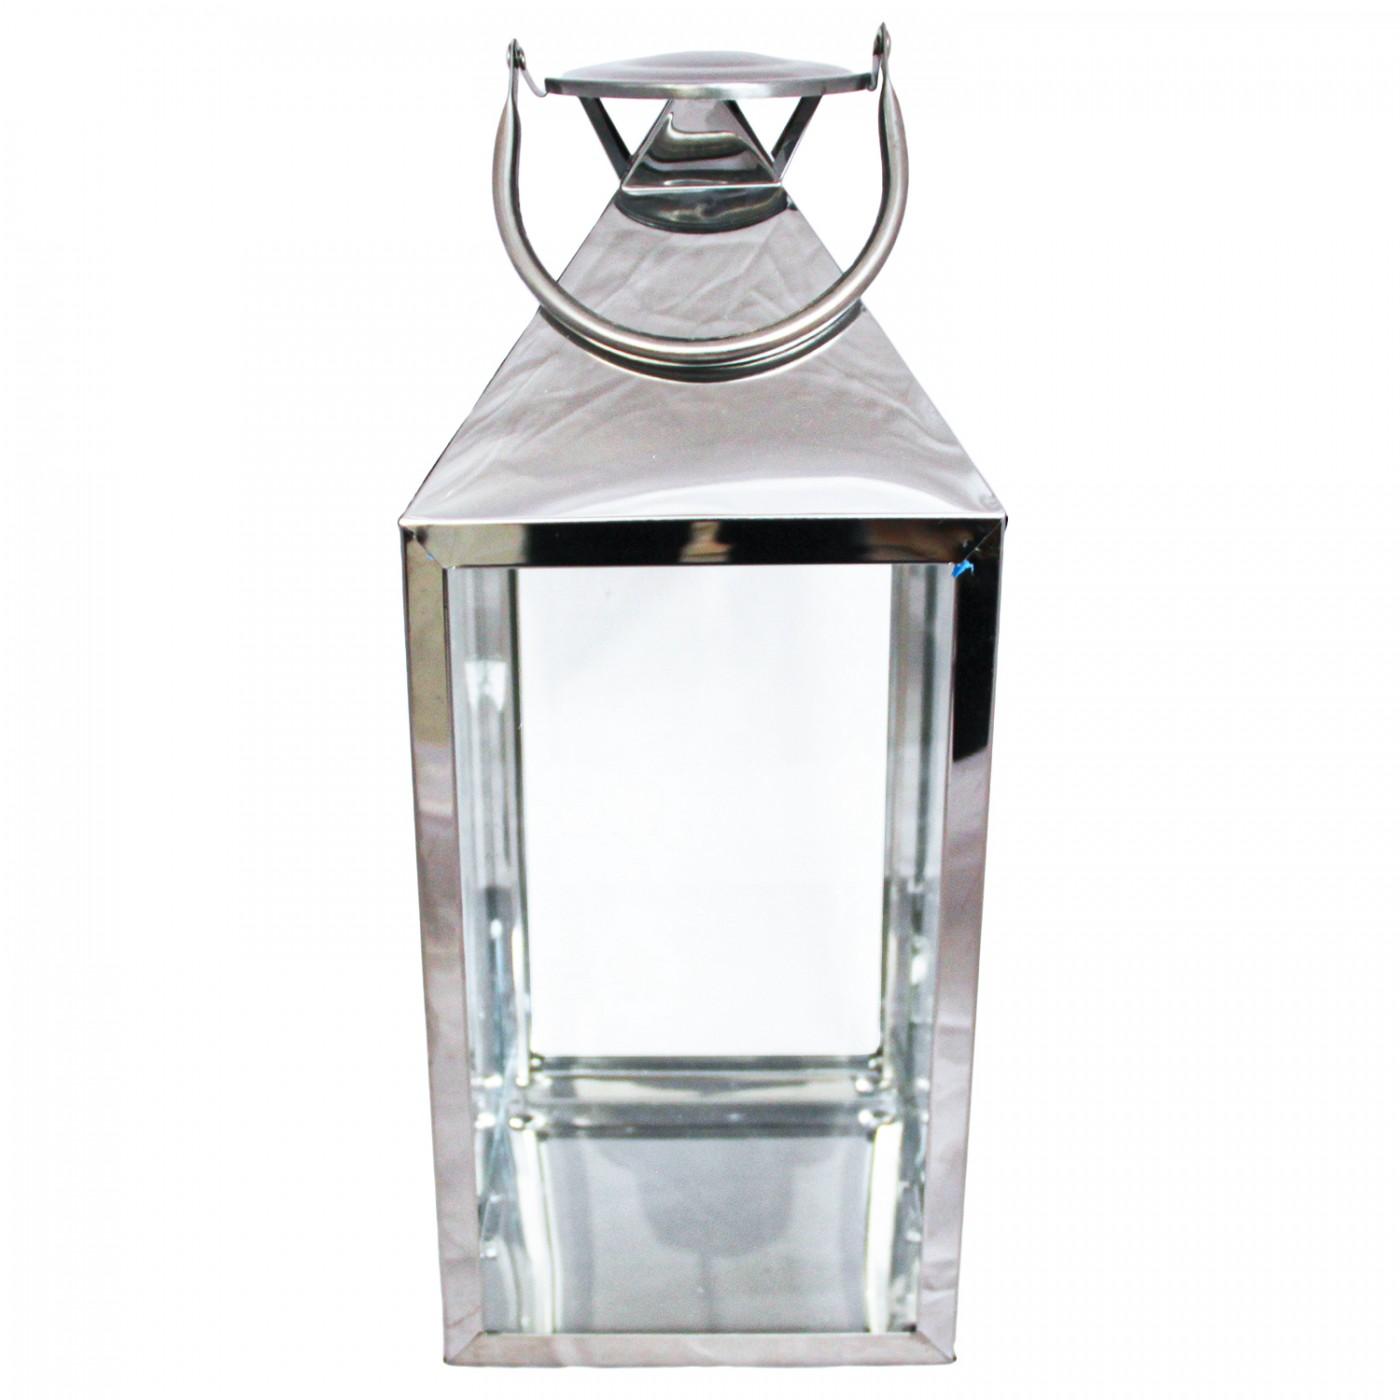 Lampion latarenka metalowa srebrna świecznik - 35 cm